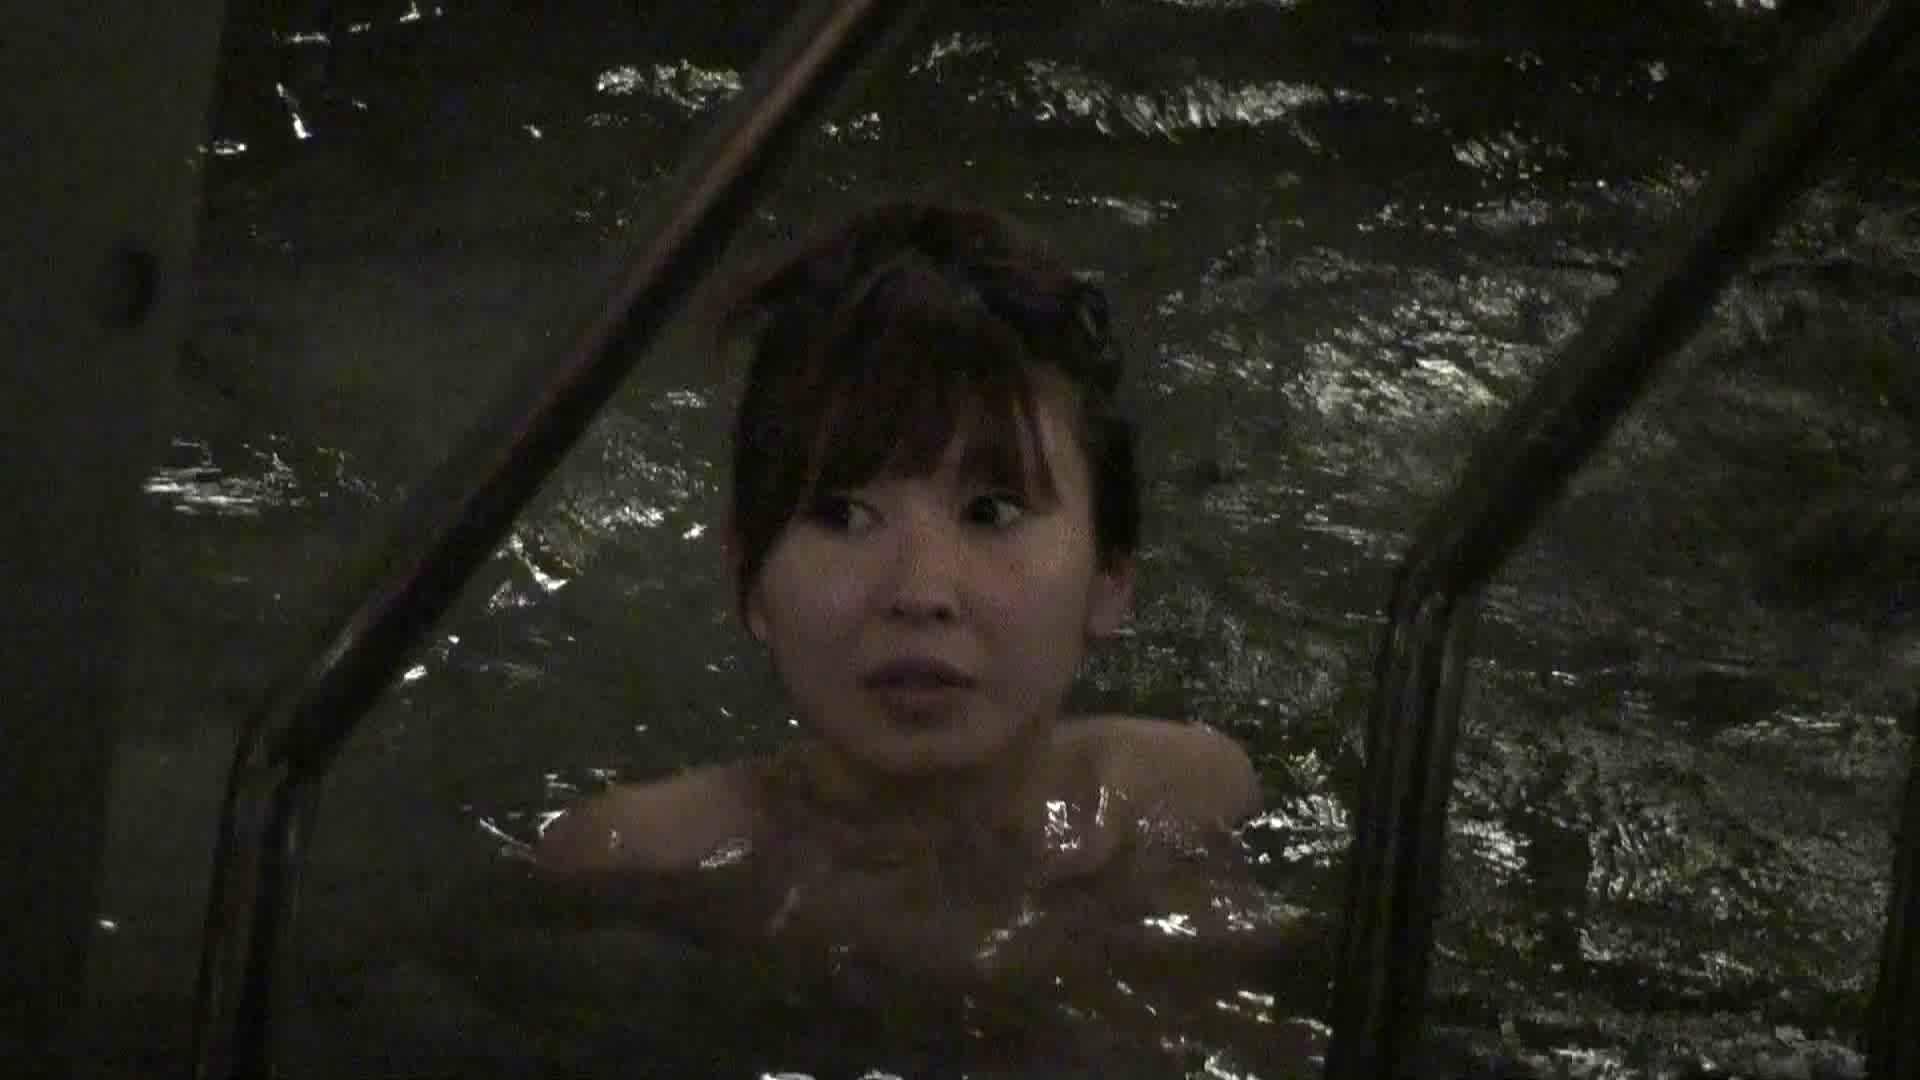 Aquaな露天風呂Vol.410 エッチな盗撮 AV無料動画キャプチャ 76pic 58